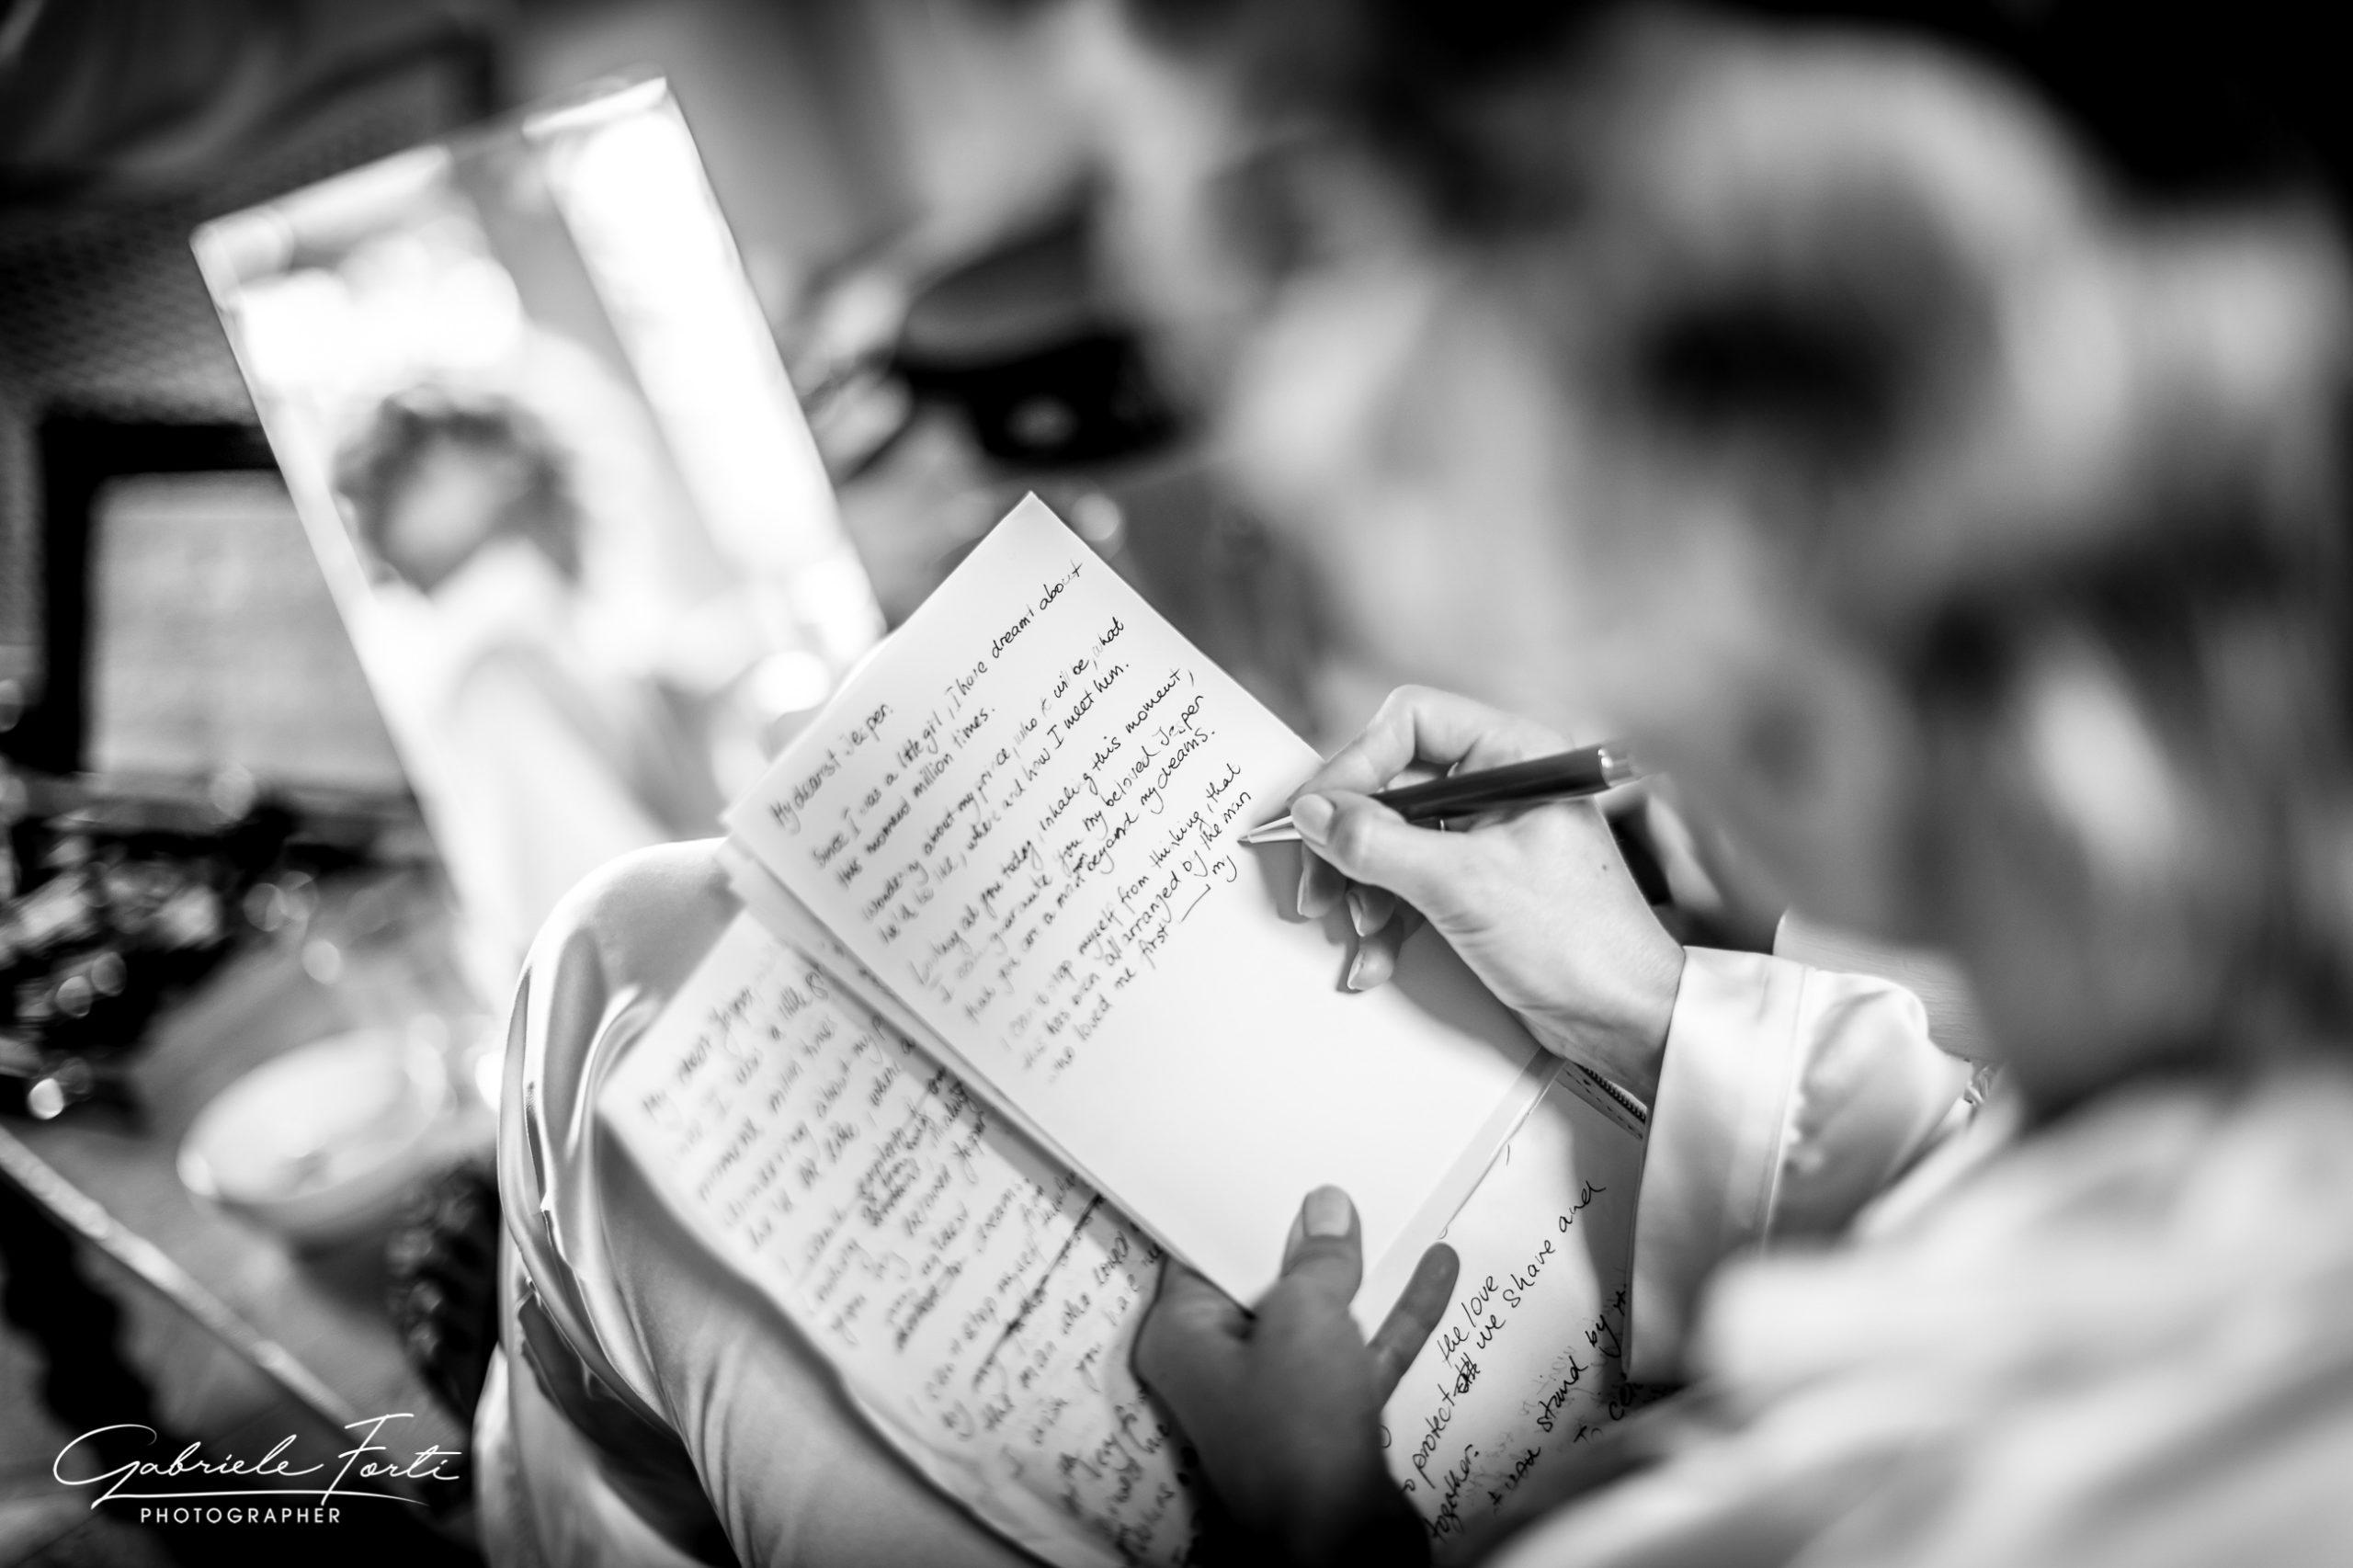 wedding-cortona-tuscany-italy-photographer-foto-forti-gabriele-2